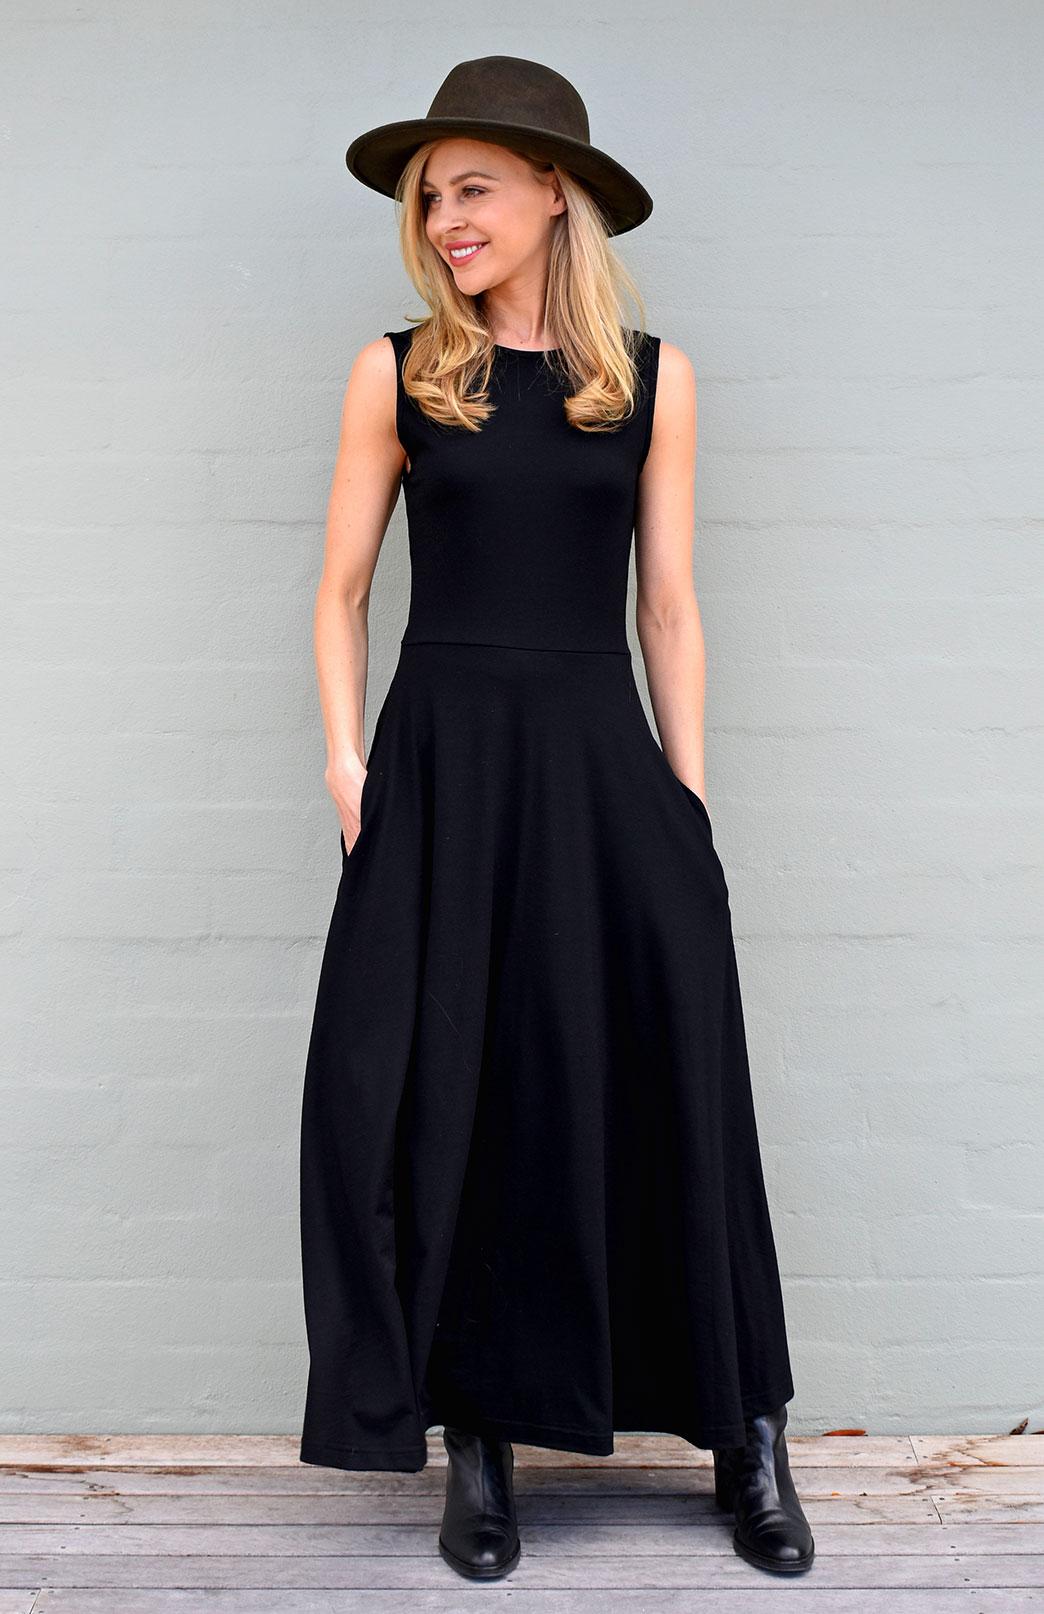 Flo Dress - Women's black sleeveless merino wool dress with high neckline, side pockets, long skirt and dropped waist - Smitten Merino Tasmania Australia